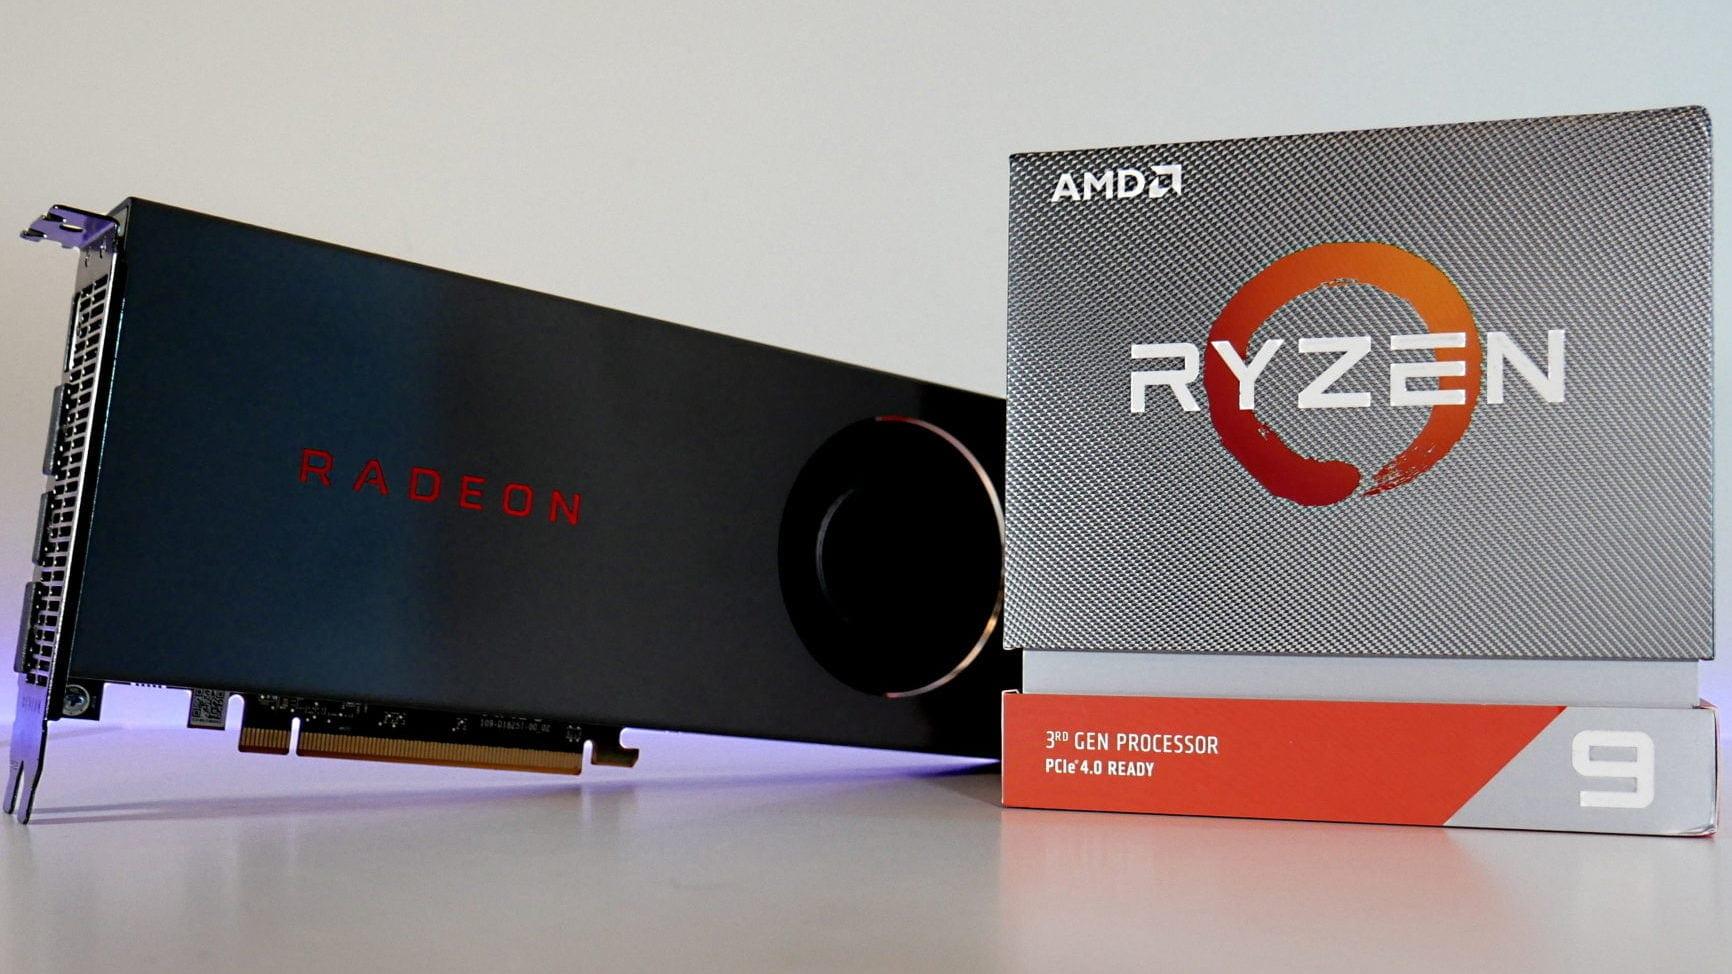 Splave поставил два рекорда на Radeon HD 6950 в модельном зачете